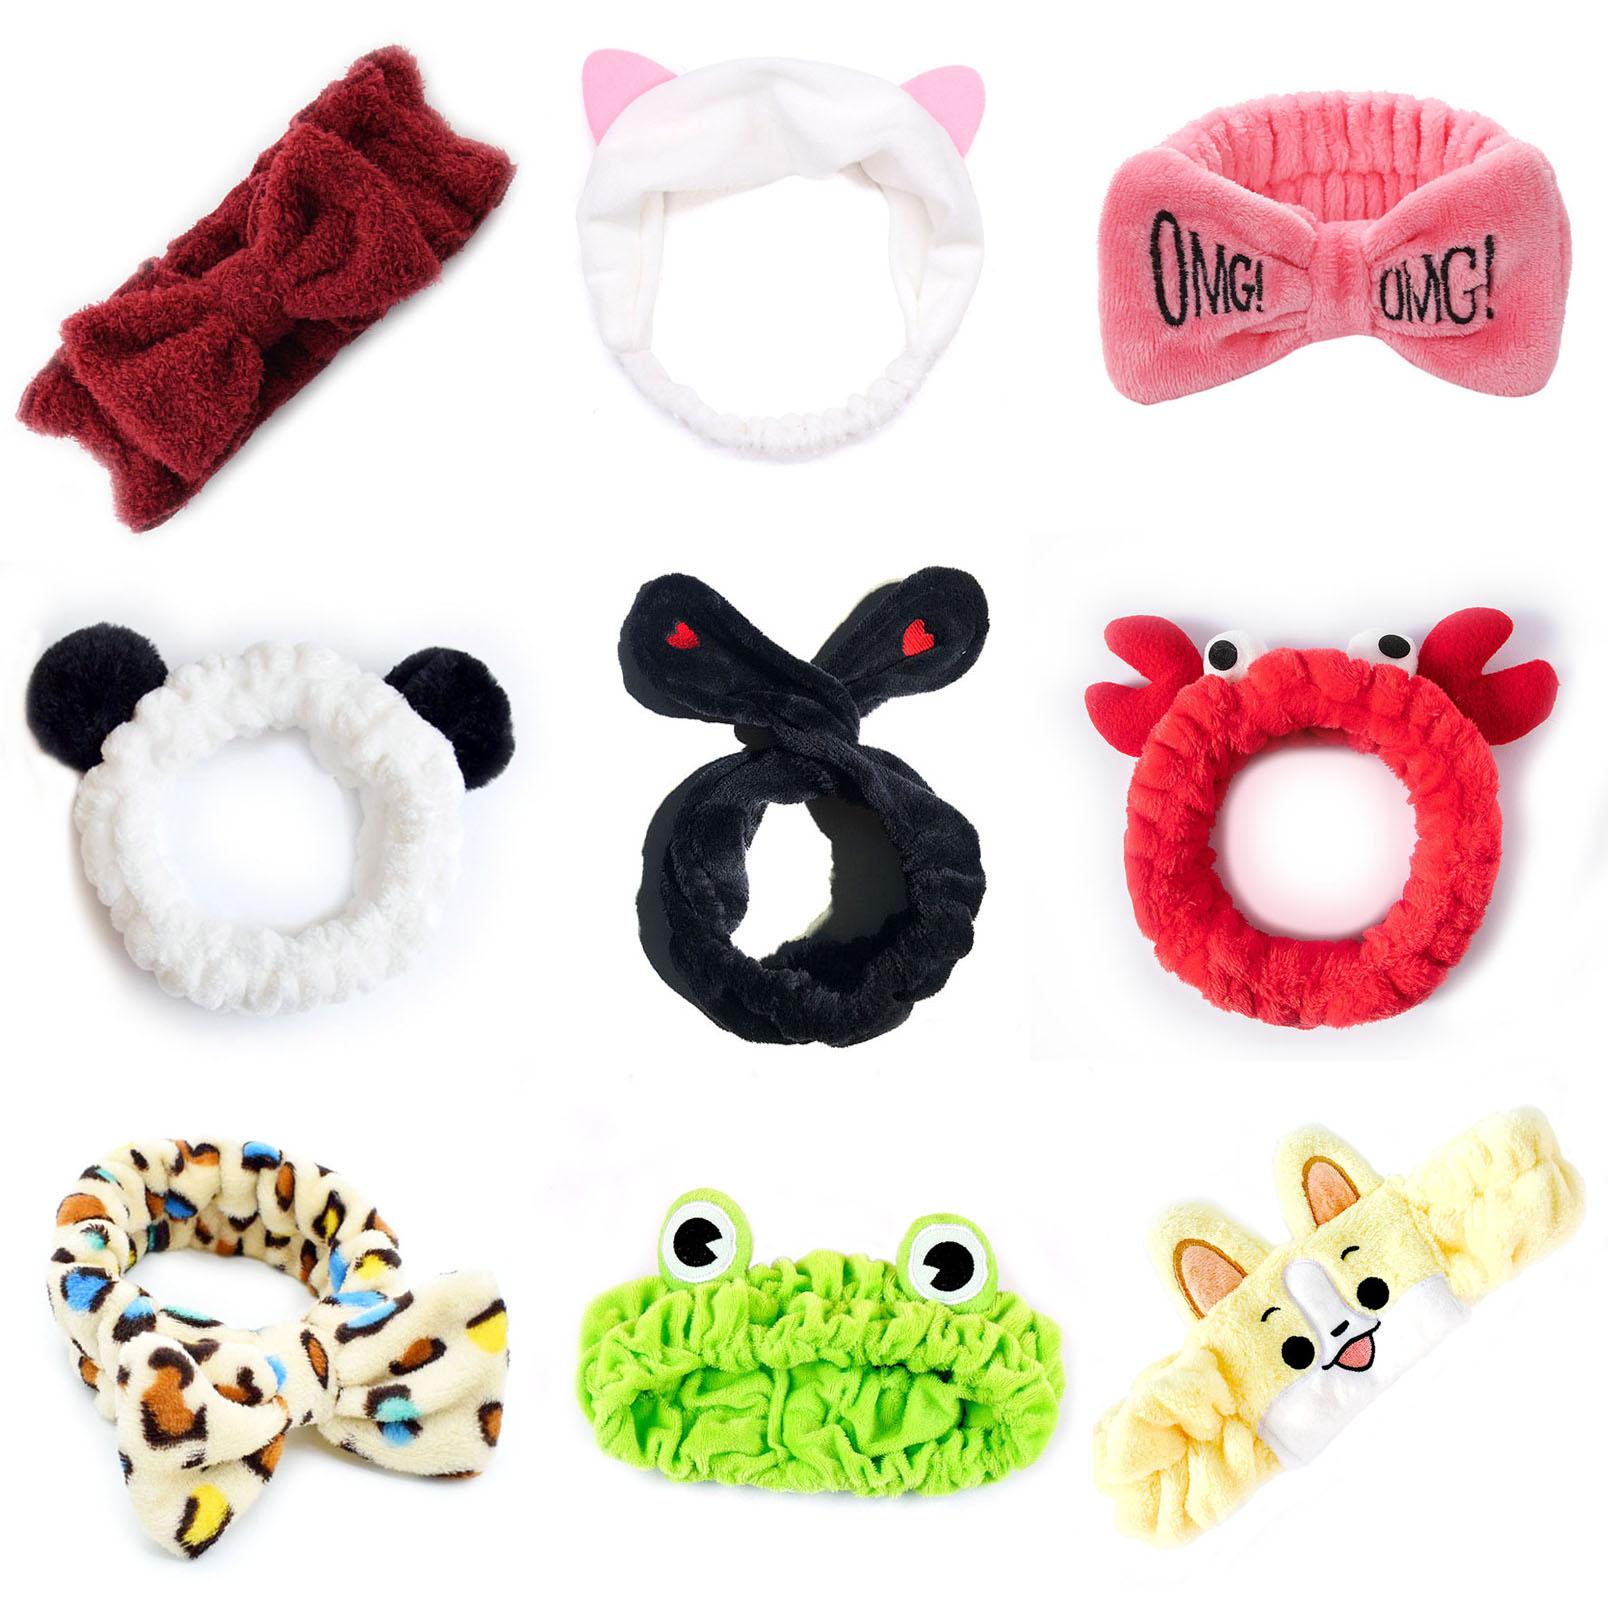 Headwear For Women New Stretch Hair Band Wash Makeup Headband Children Kids Hair Band Bow OMG Bunny Girl Cat Girl